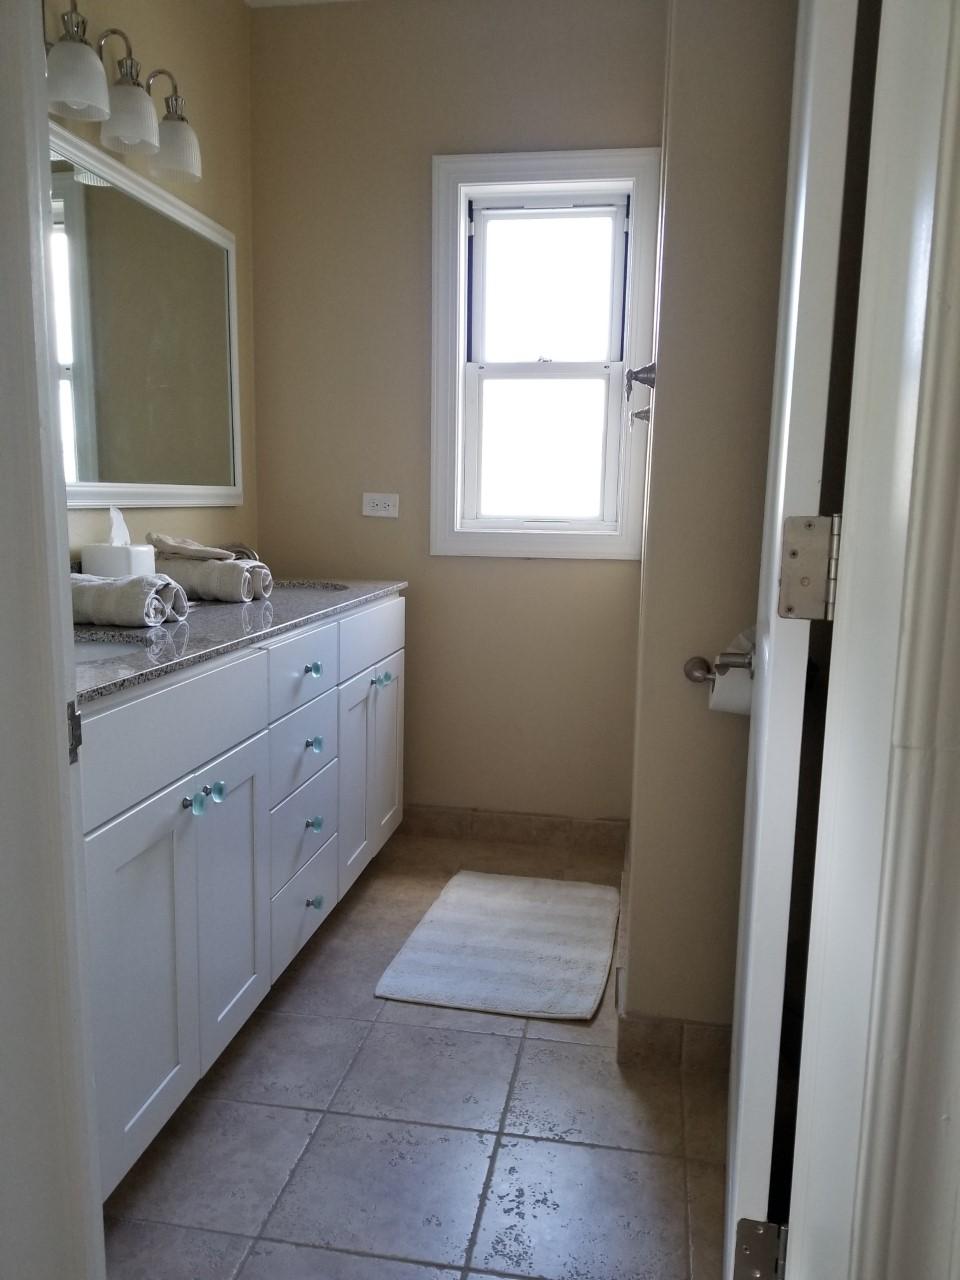 New bath off bedroom #2